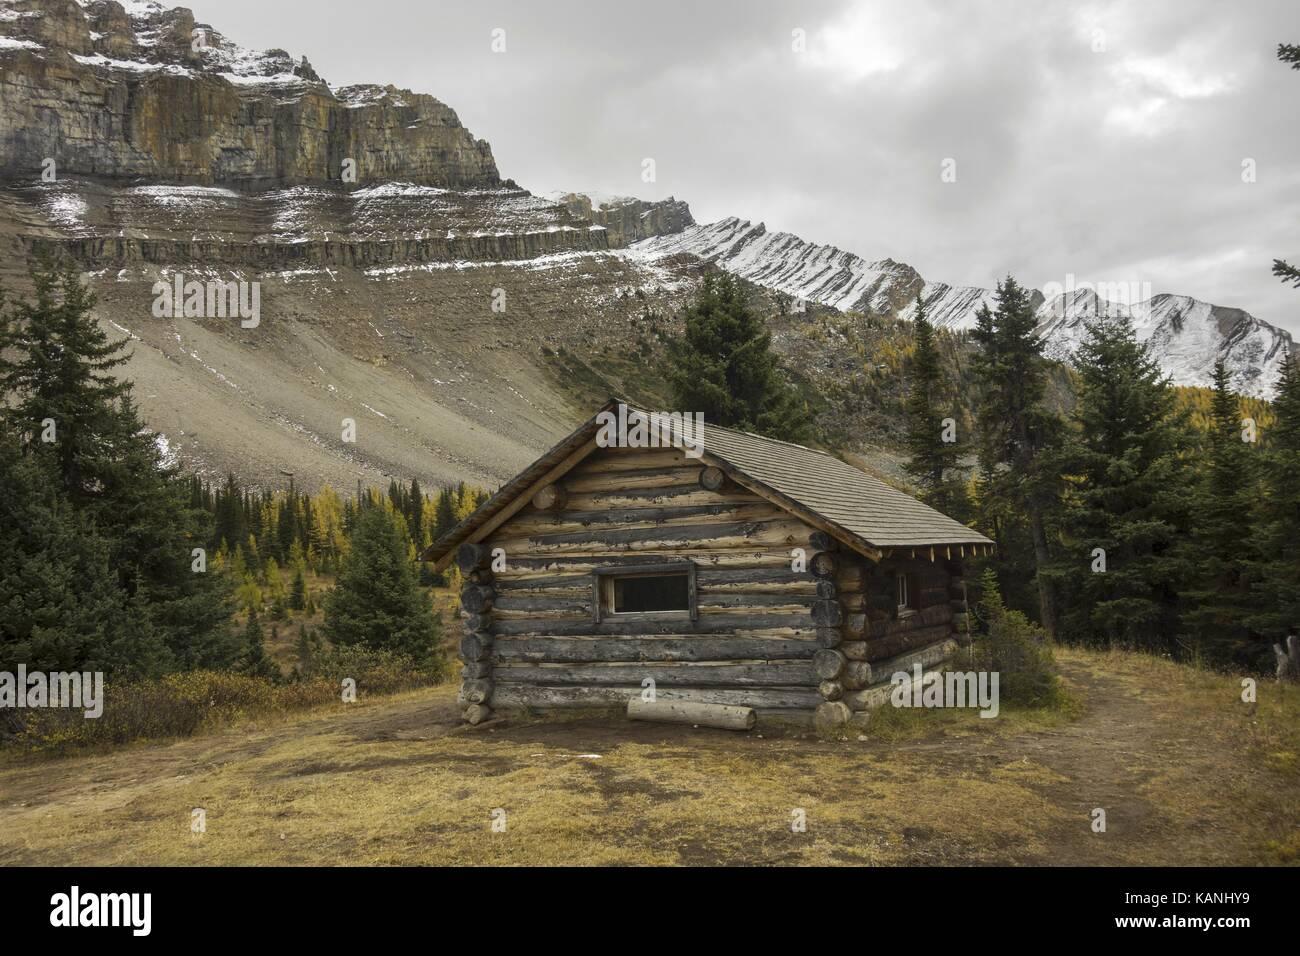 Halfway Hut, vintage landmark log cabin on great hiking trail to Skoki area of Banff National Park near Lake Louise - Stock Image